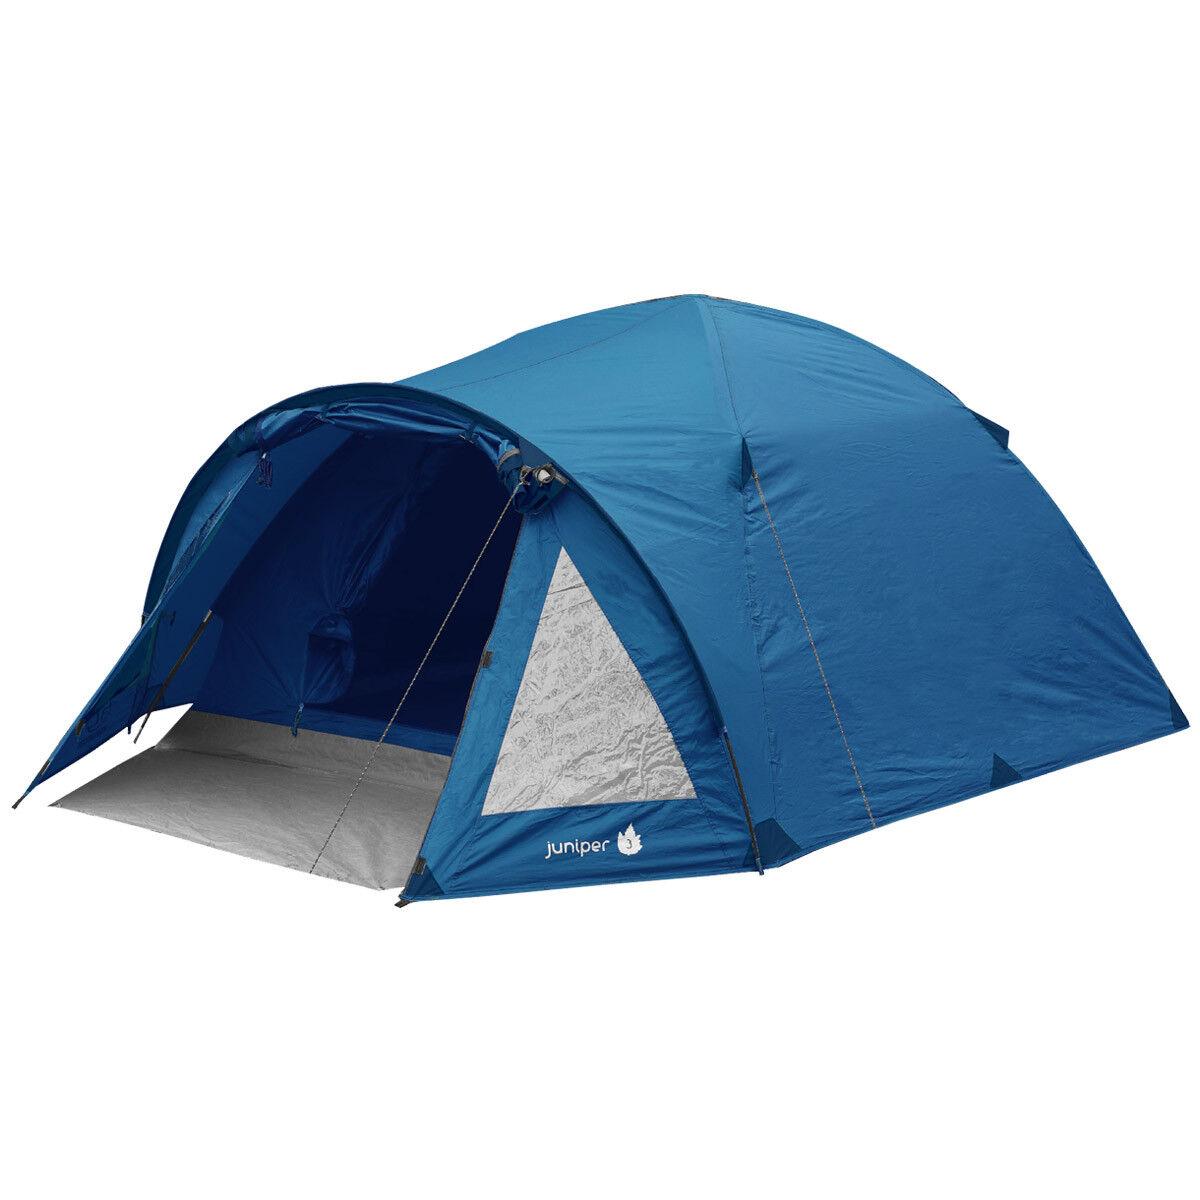 Highlander Wacholder 3 Personen Kuppel Zelt Feste Wochenend-Camping Wandern Blau